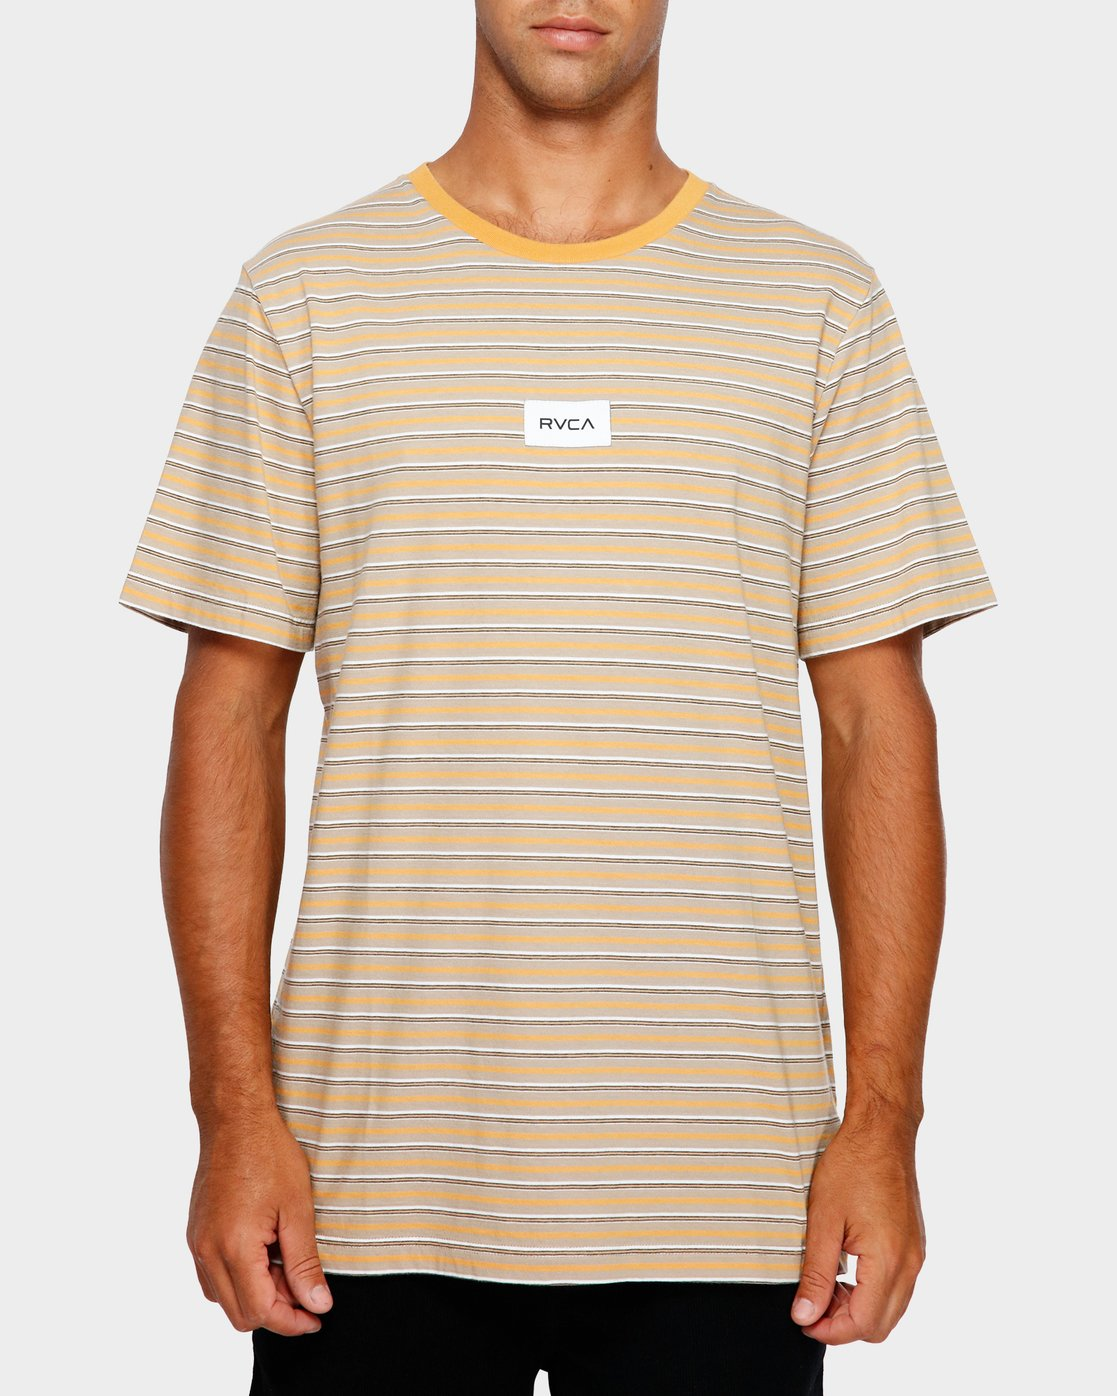 1 RVCA Focus Stripe T-Shirt Yellow R191049 RVCA